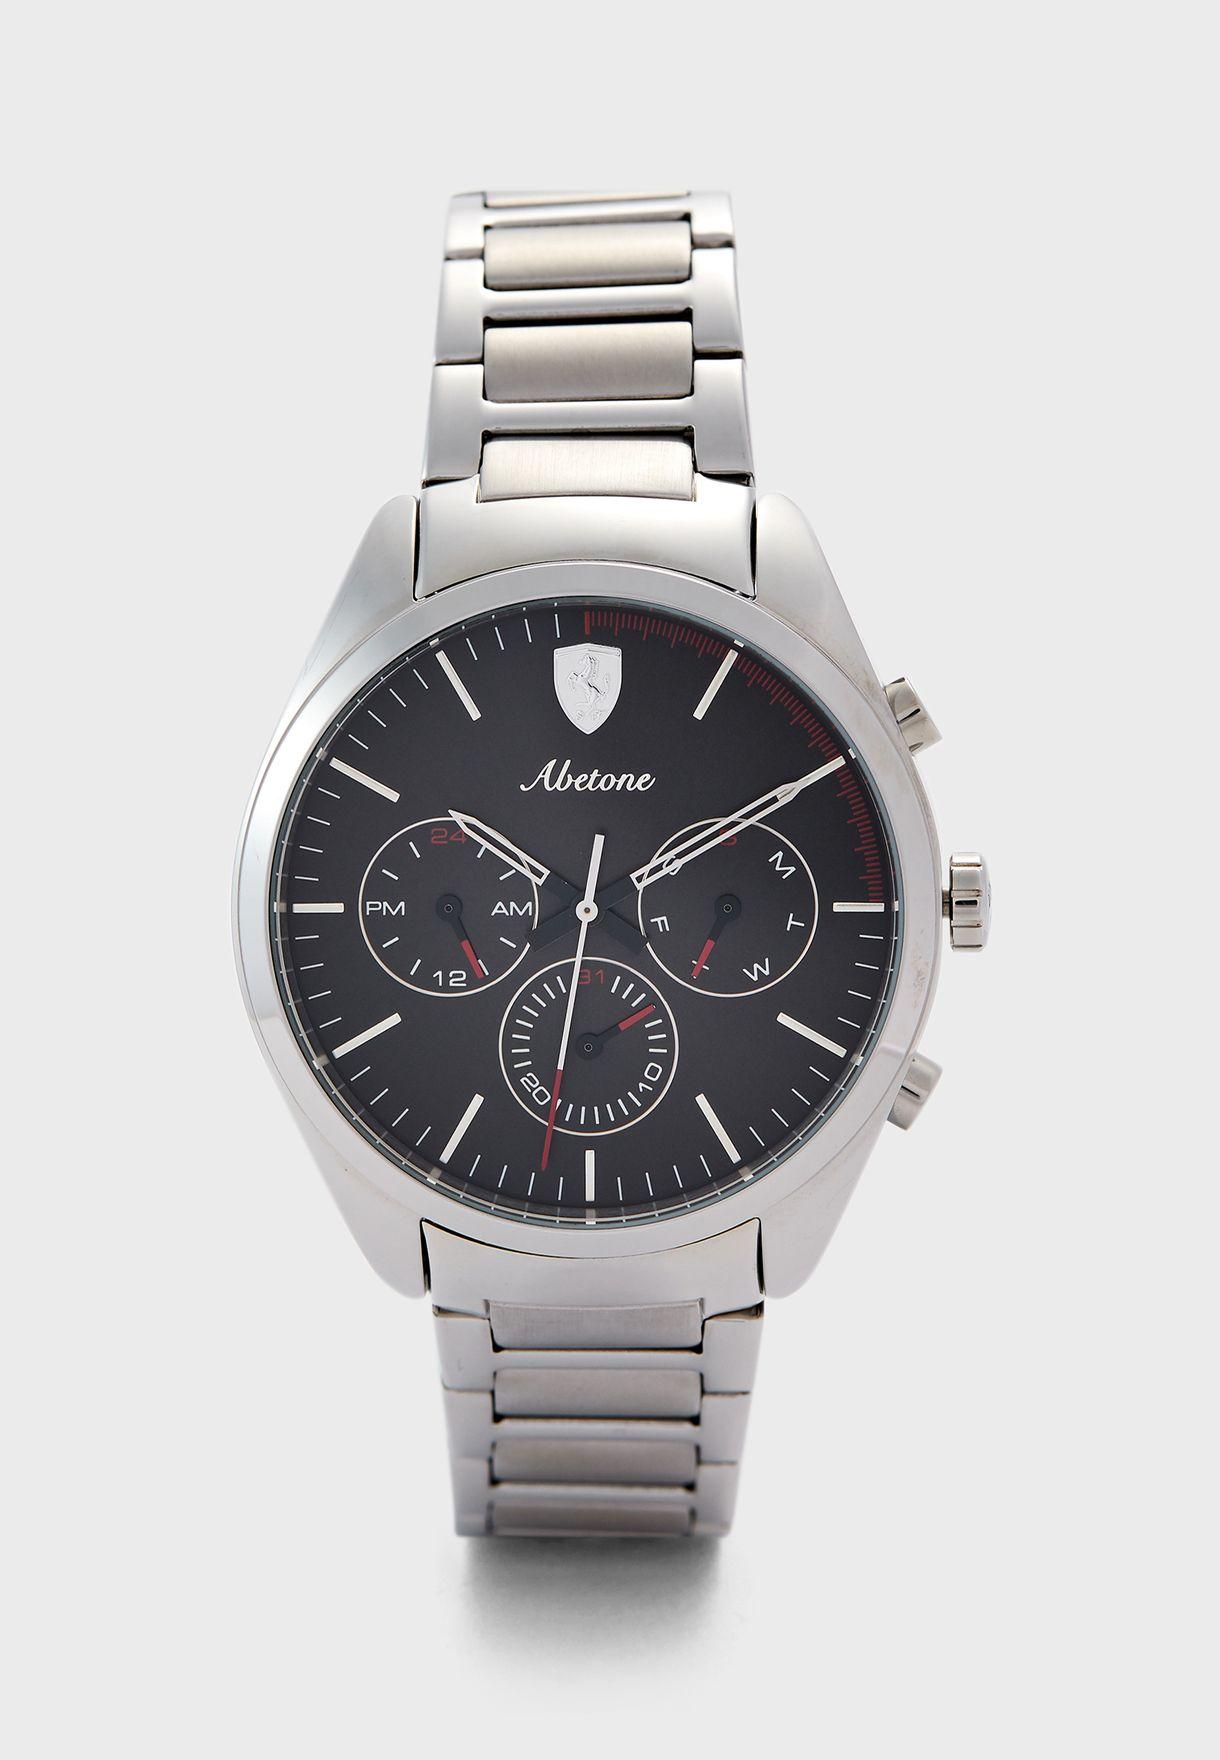 Abton Chronograph Analog Watch